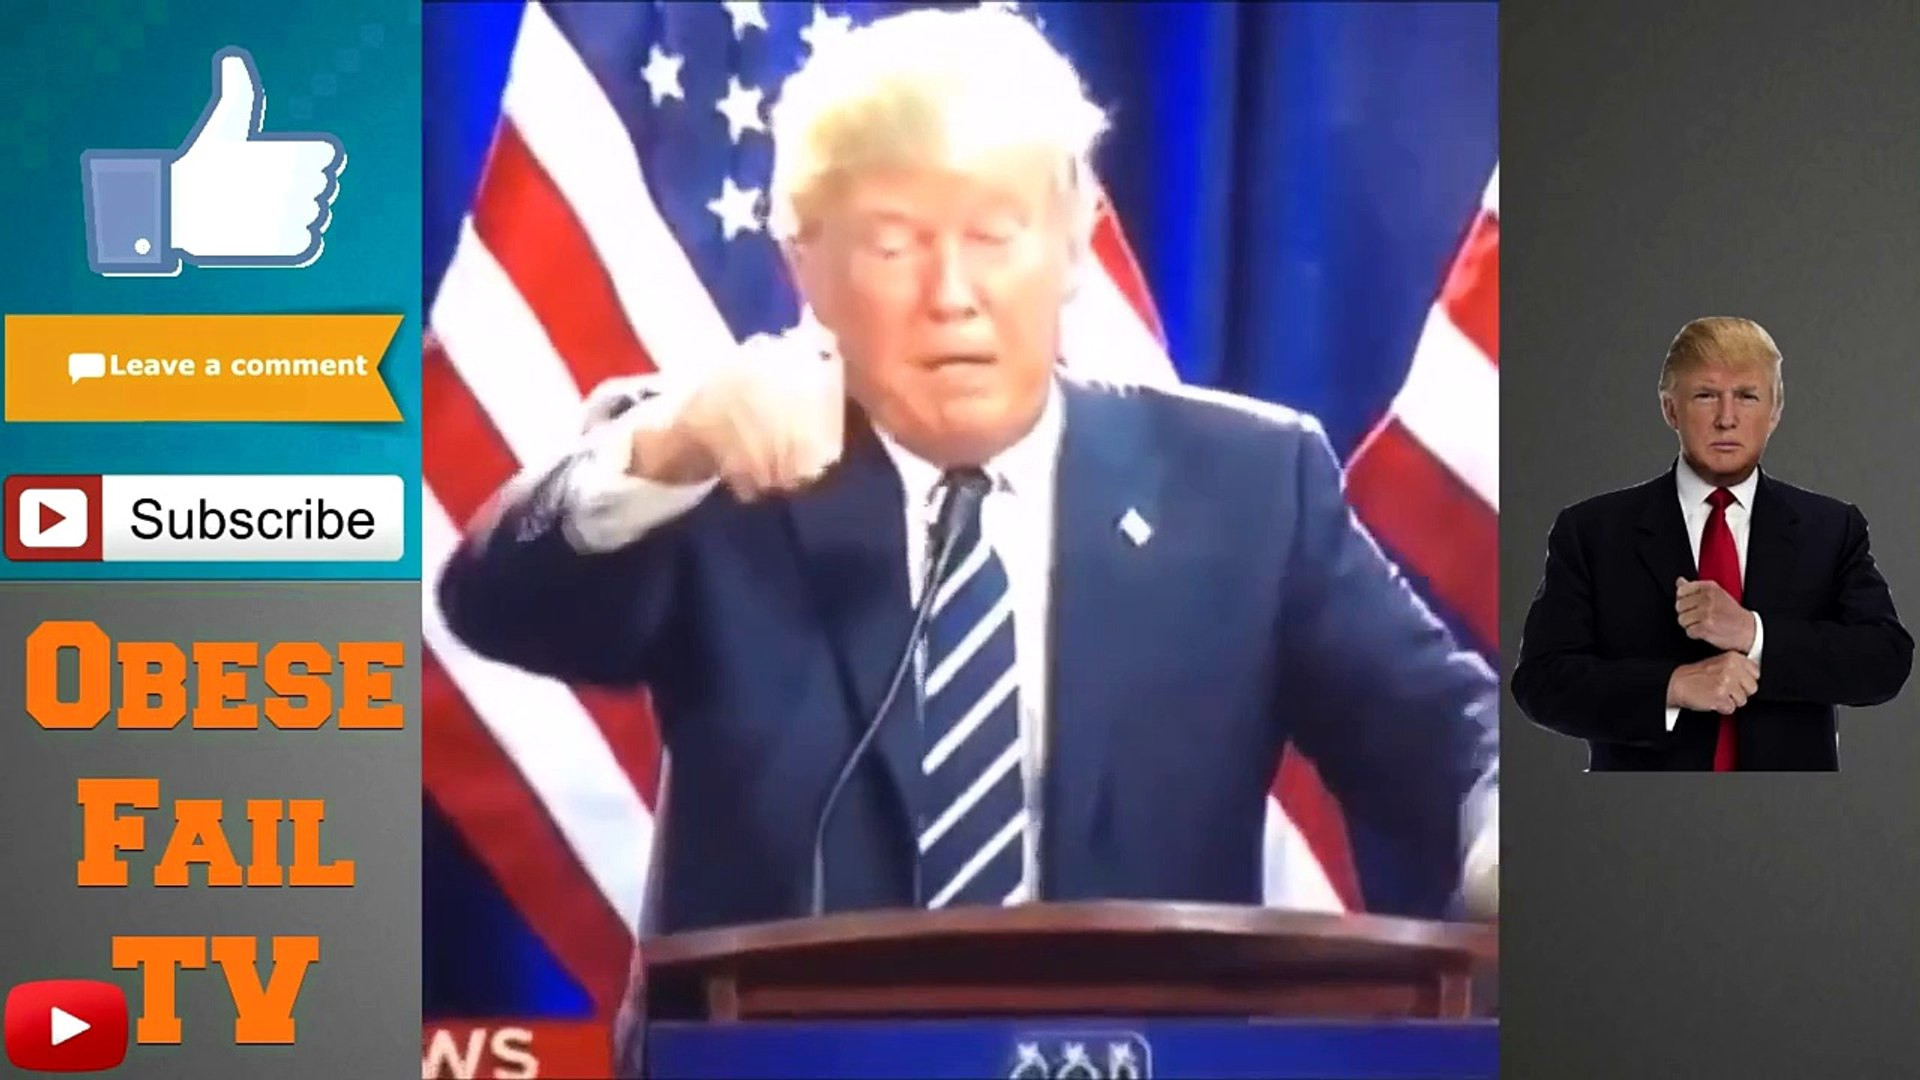 Funny DONALD TRUMP Compilation | Donald Trump Best Vines Compilation | Donald Trump Funny